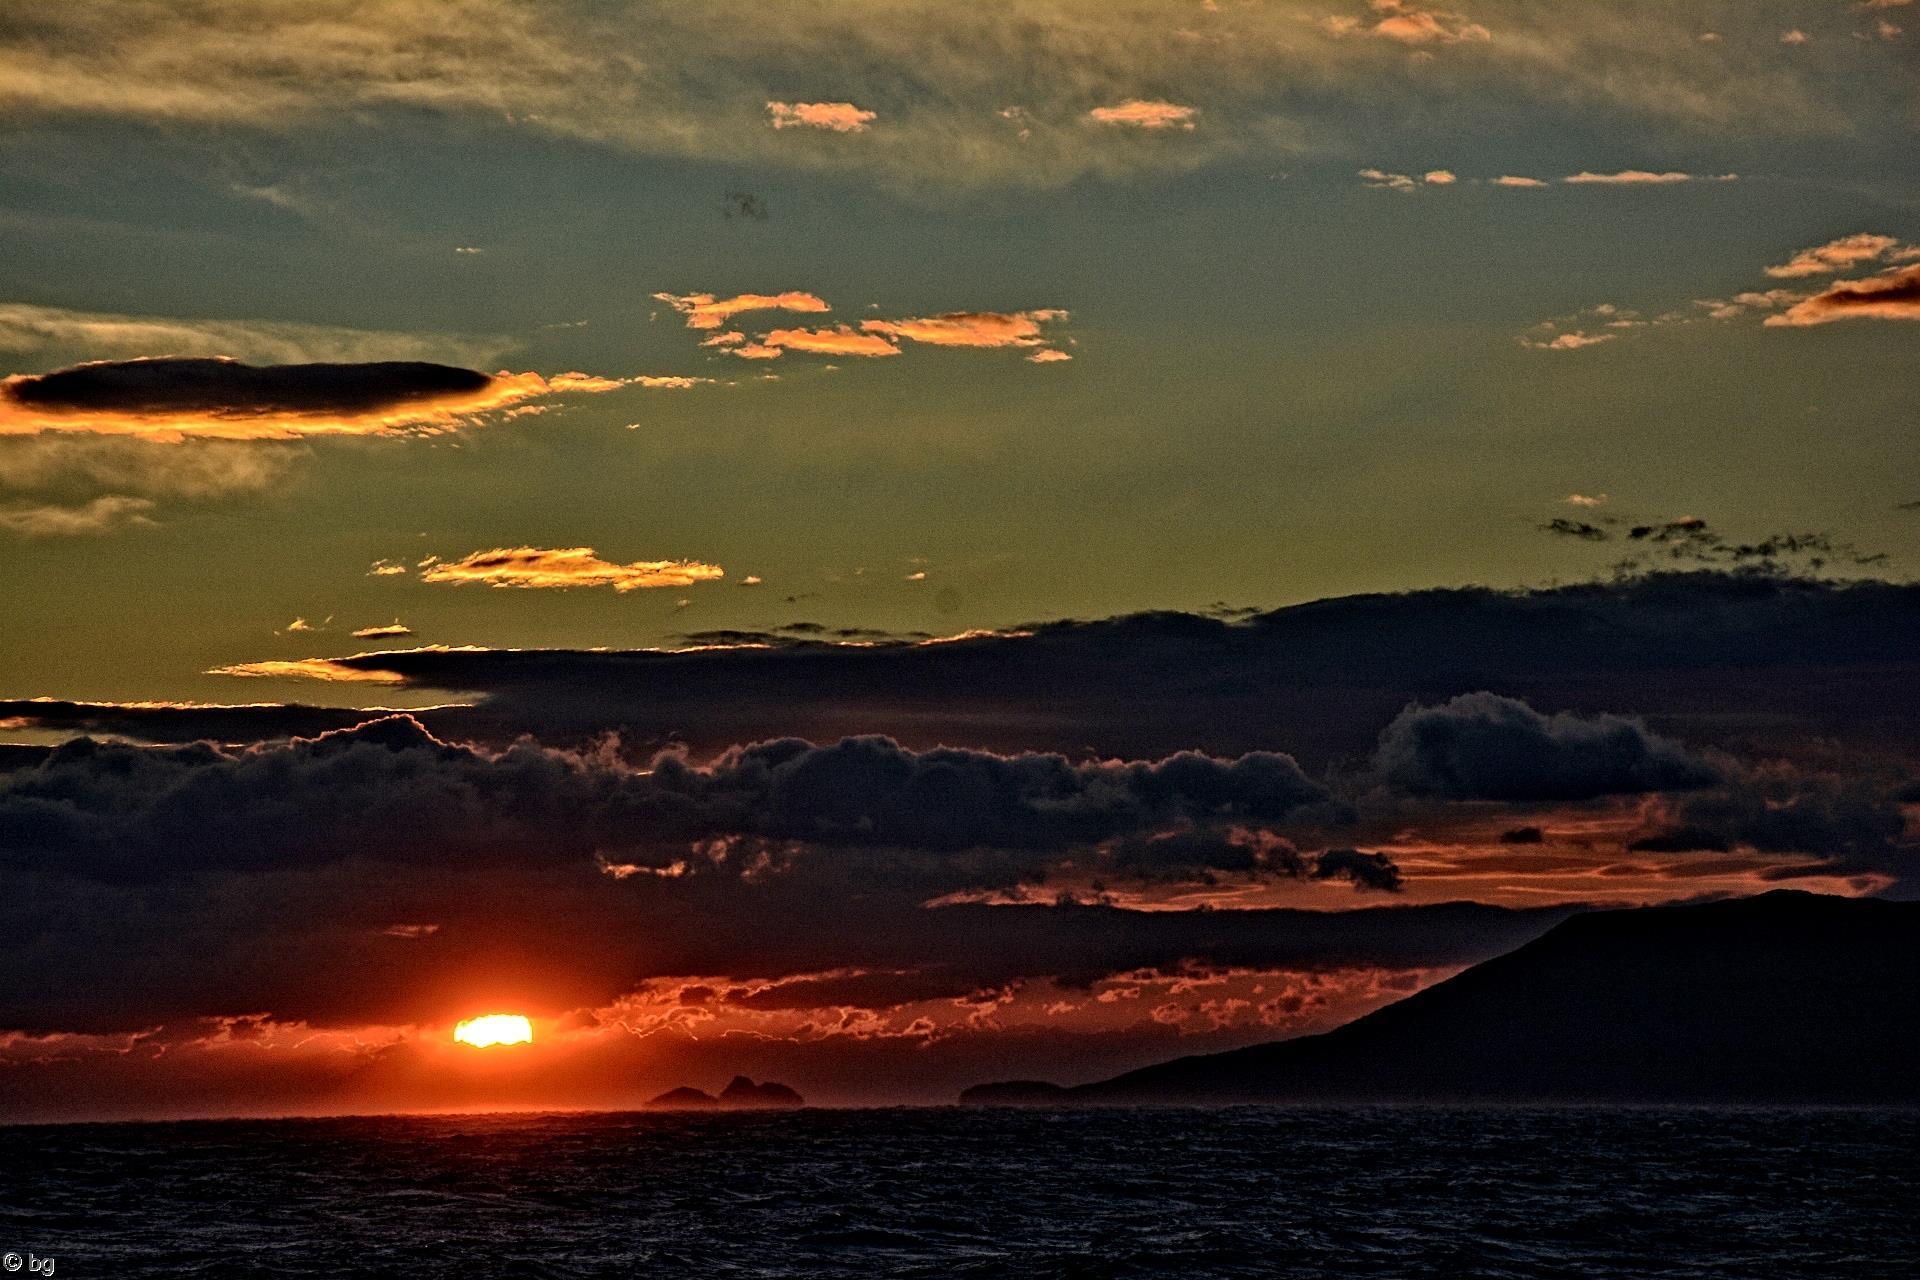 fonds-ecran-HD-coucher-du-soleil_2